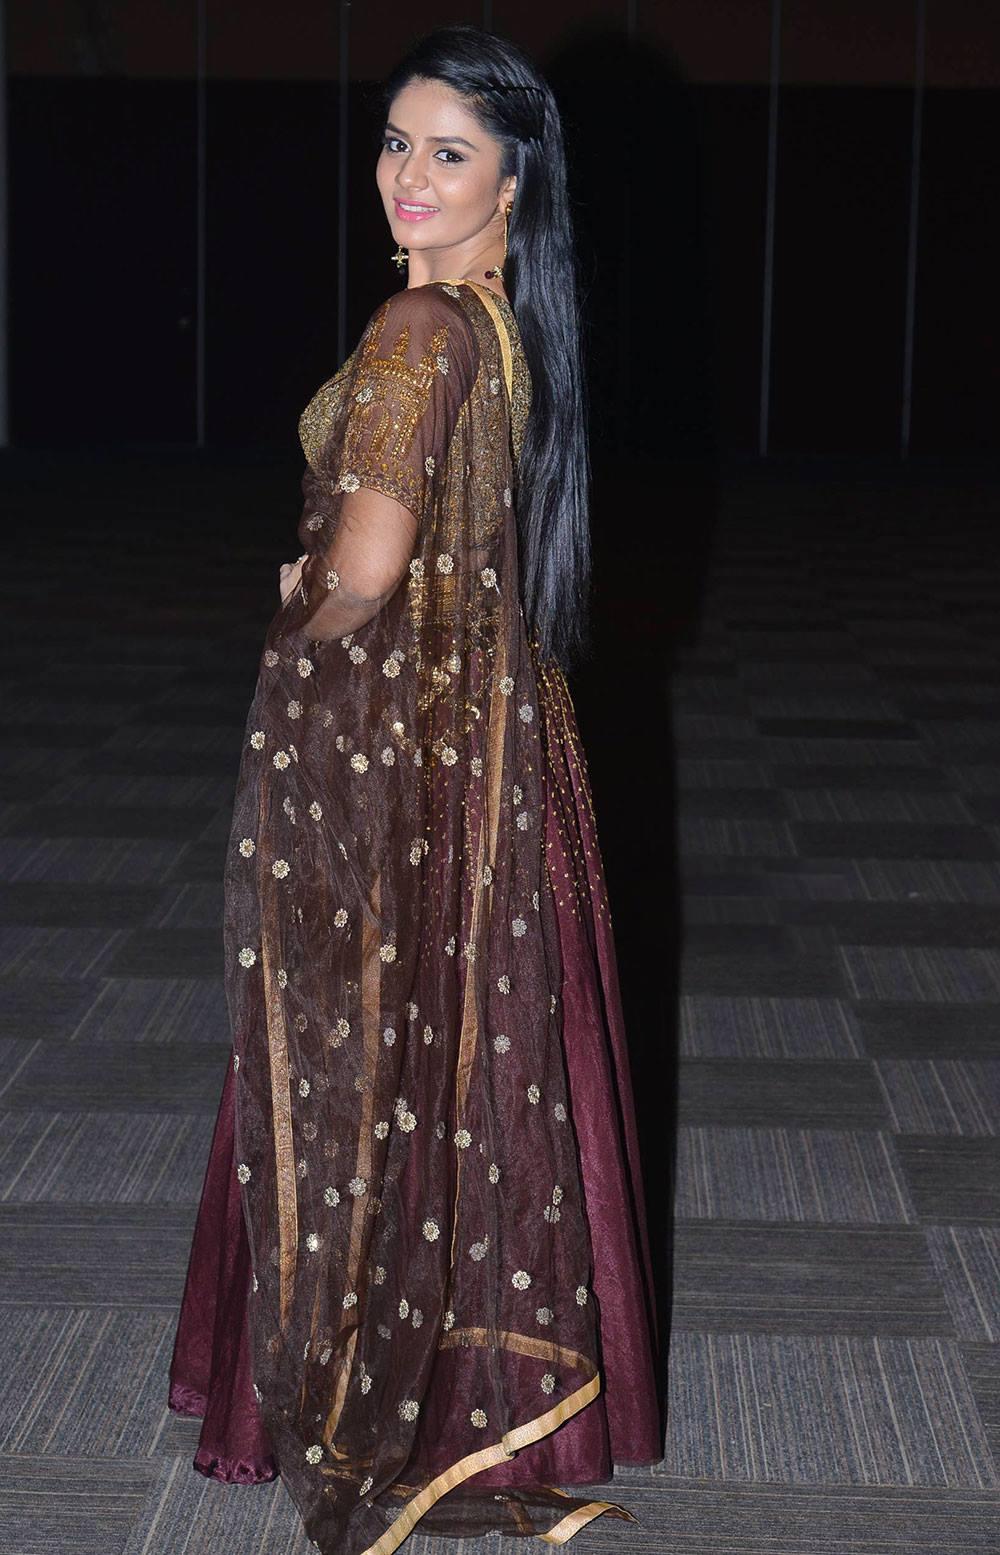 Tv Anchor Sreemukhi Long Hair In Maroon Half Saree